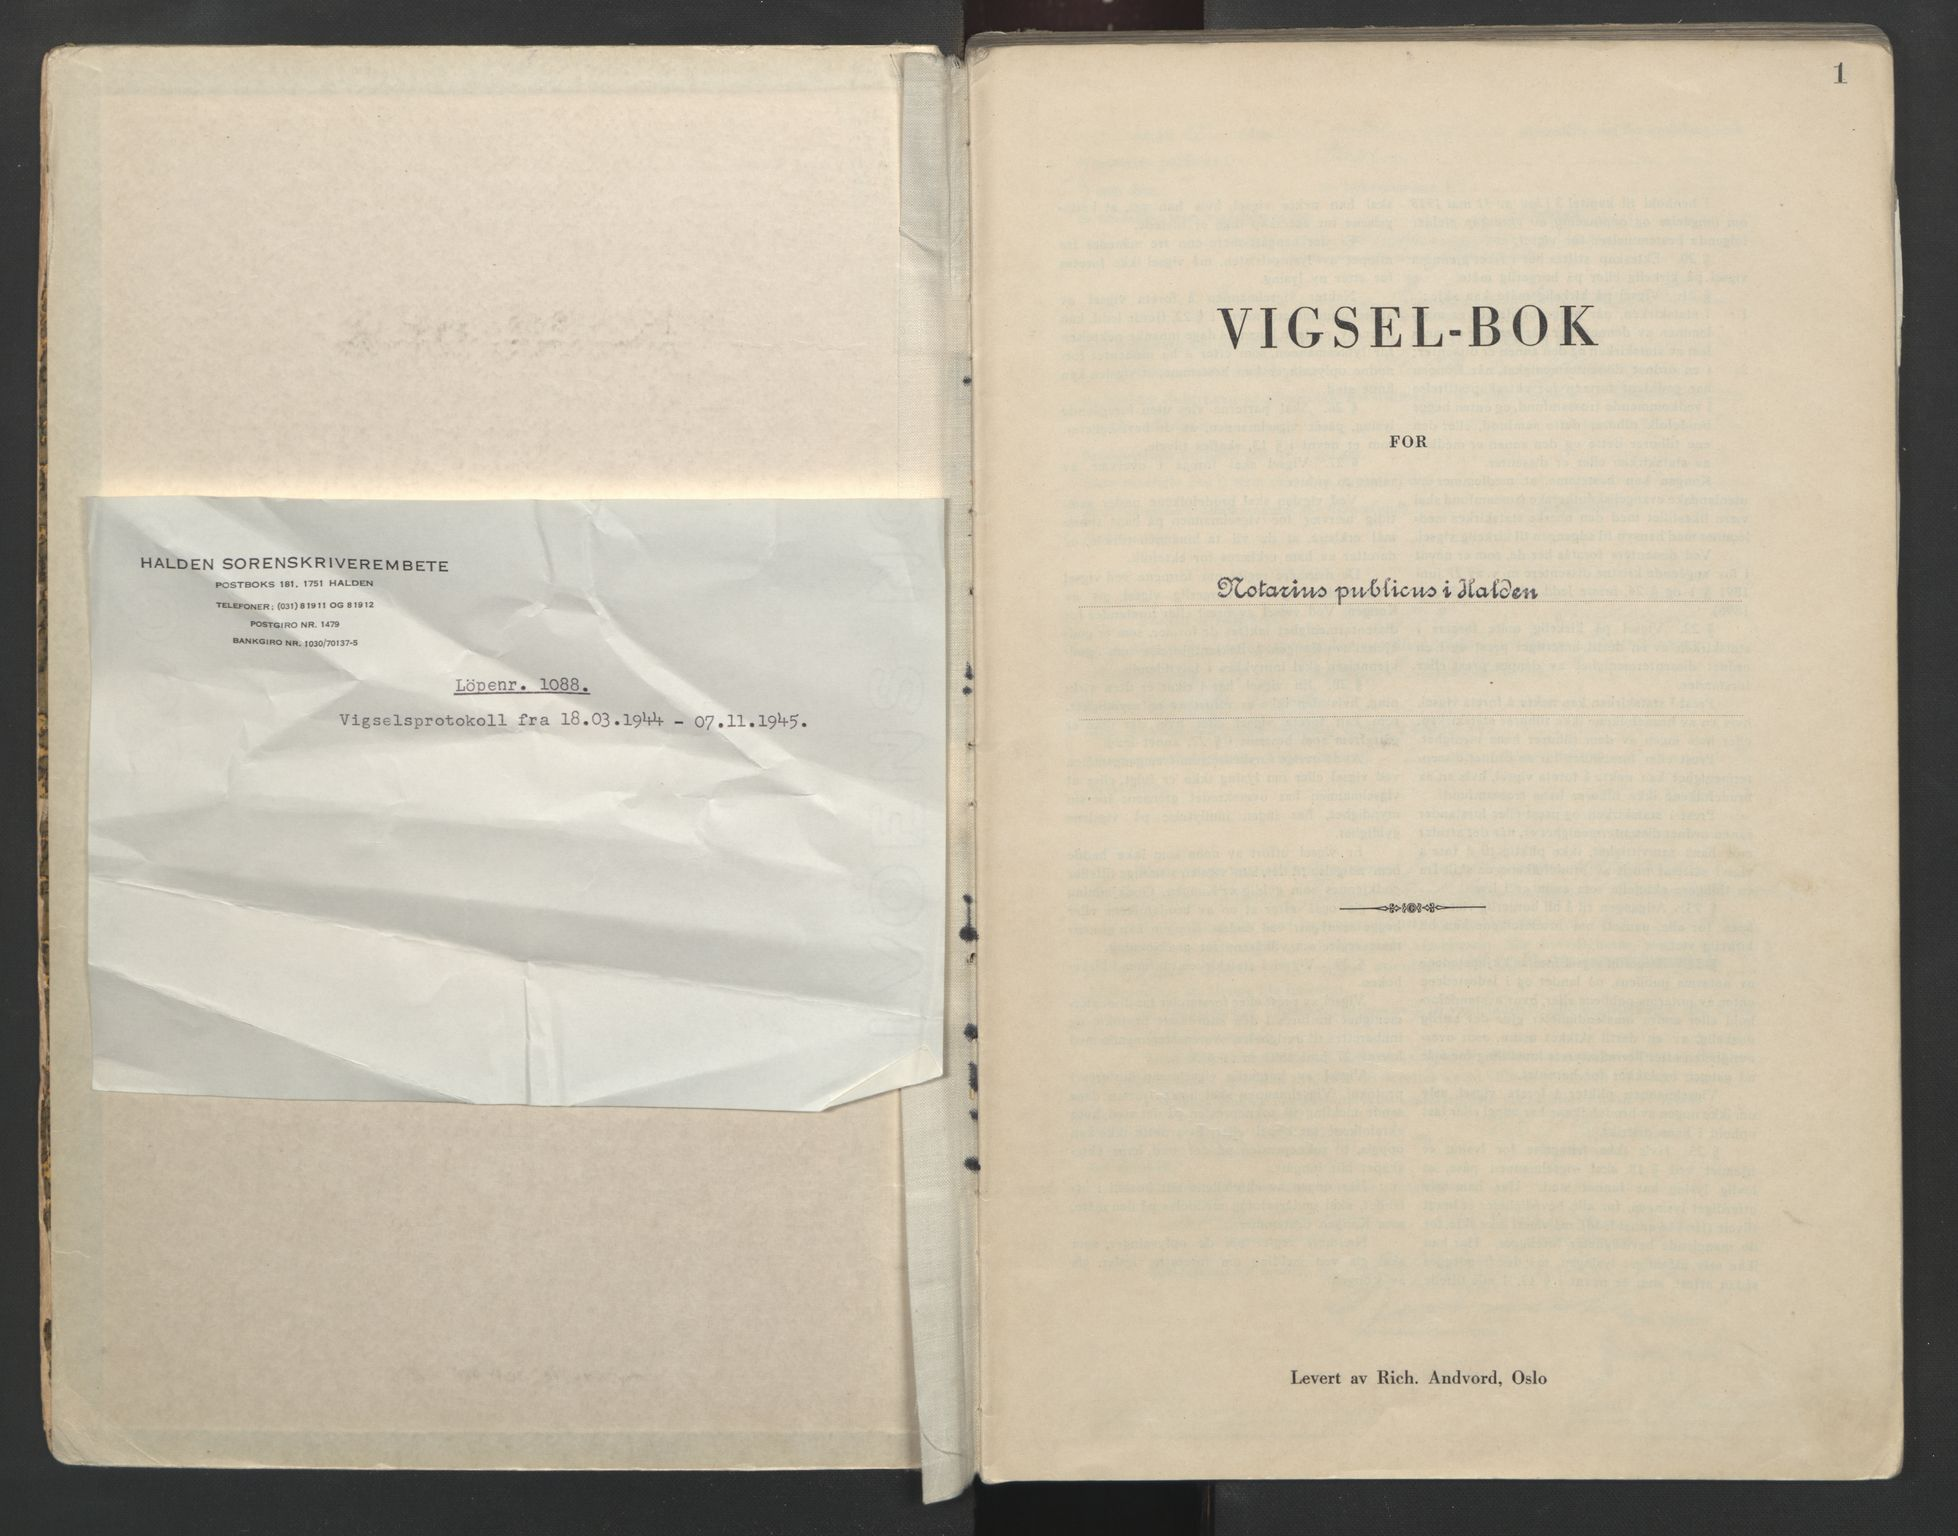 SAO, Idd og Marker sorenskriveri, L/Lc/L0001: Vigselsbøker, 1944-1945, s. 1